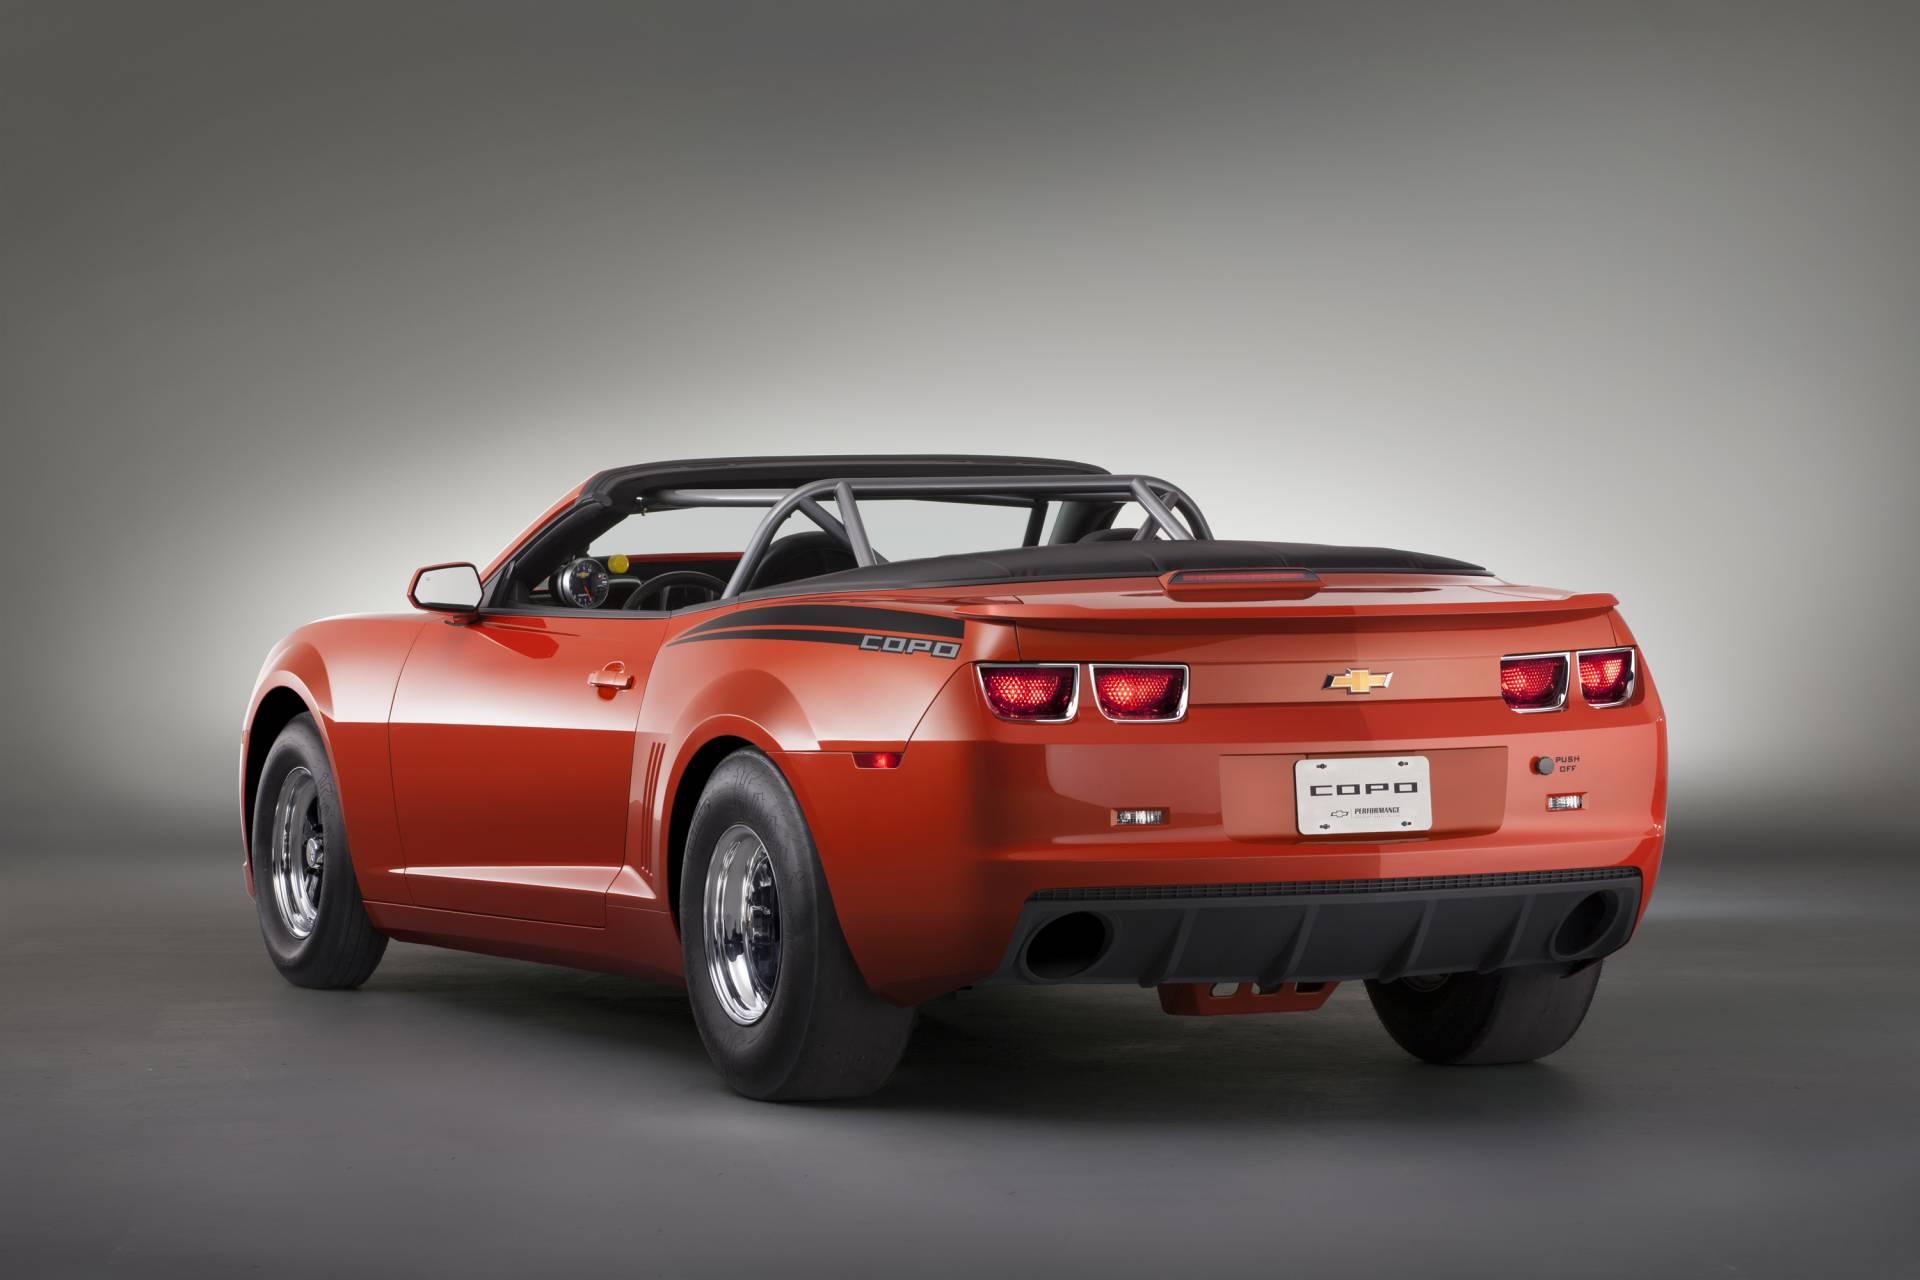 2012 Chevrolet Inferno Orange COPO Camaro